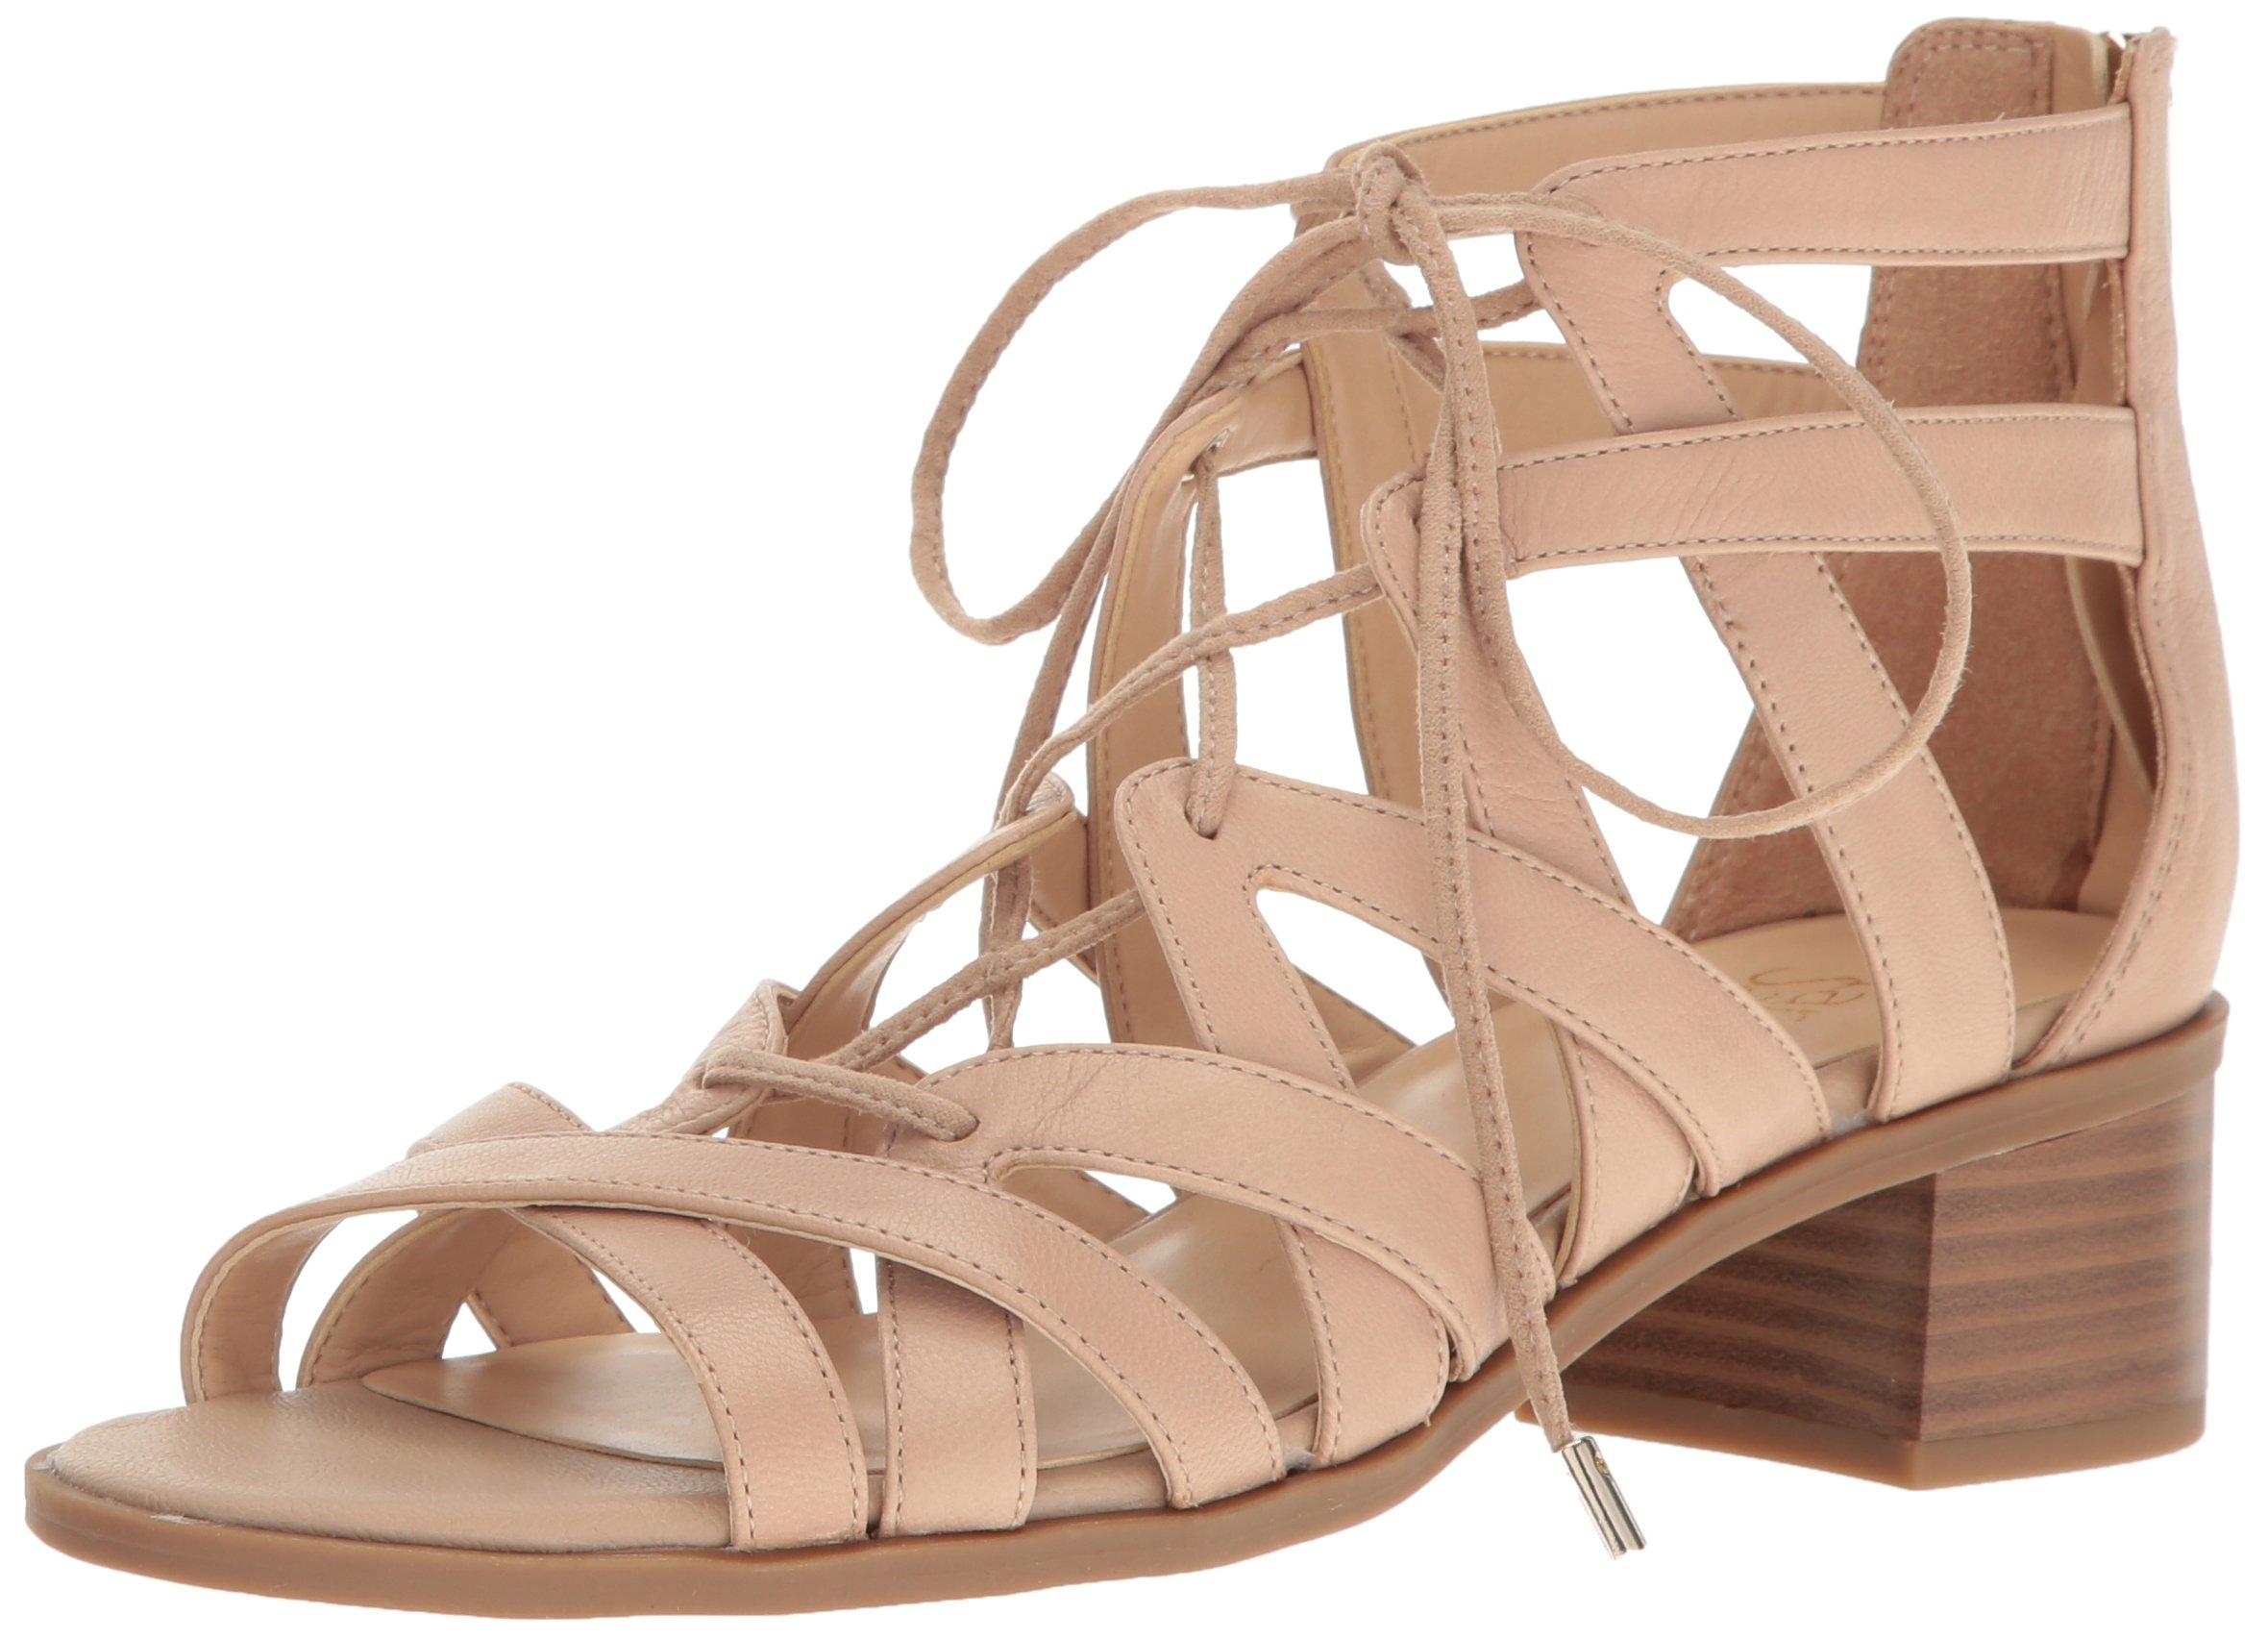 Franco Sarto Women's Ocean Heeled Sandal, Soft Beige, 9 Medium US